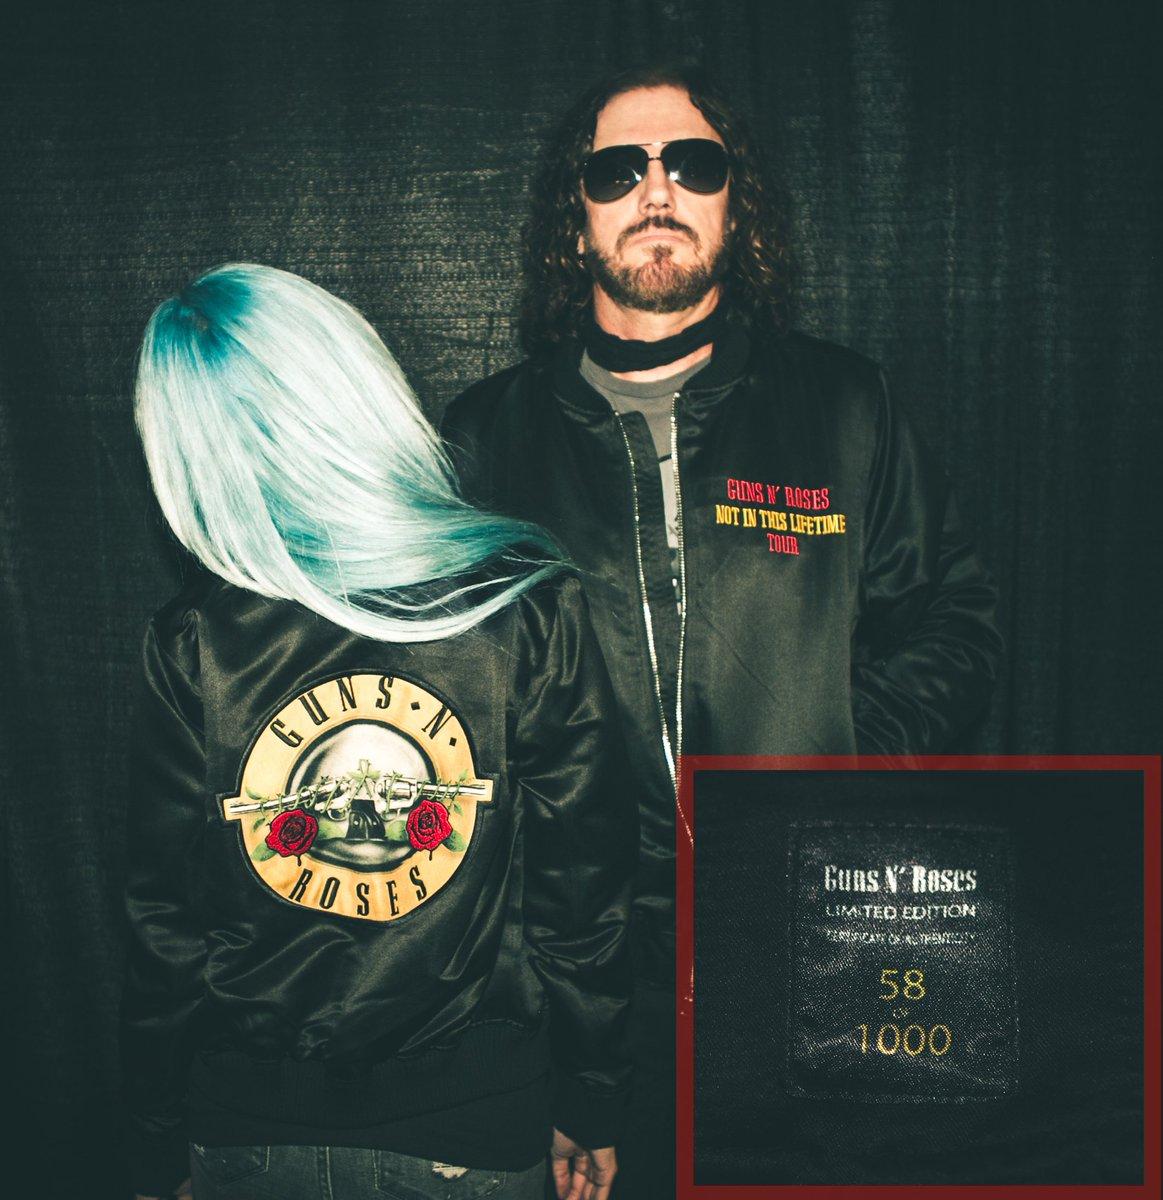 69d0caab5 Guns N' Roses on Twitter: